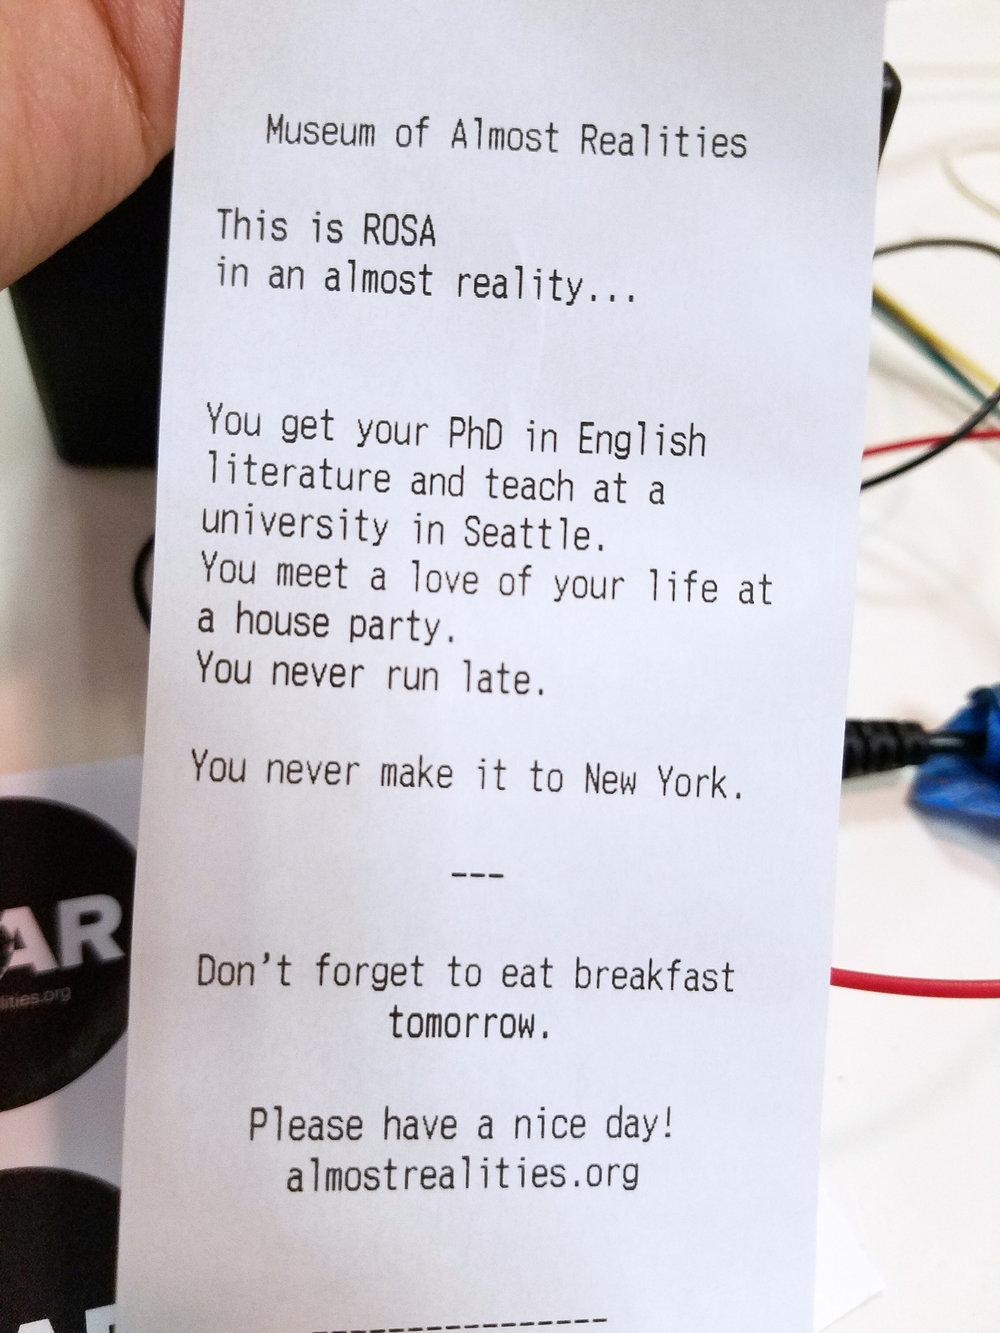 MoAR receipt -rosa.jpg